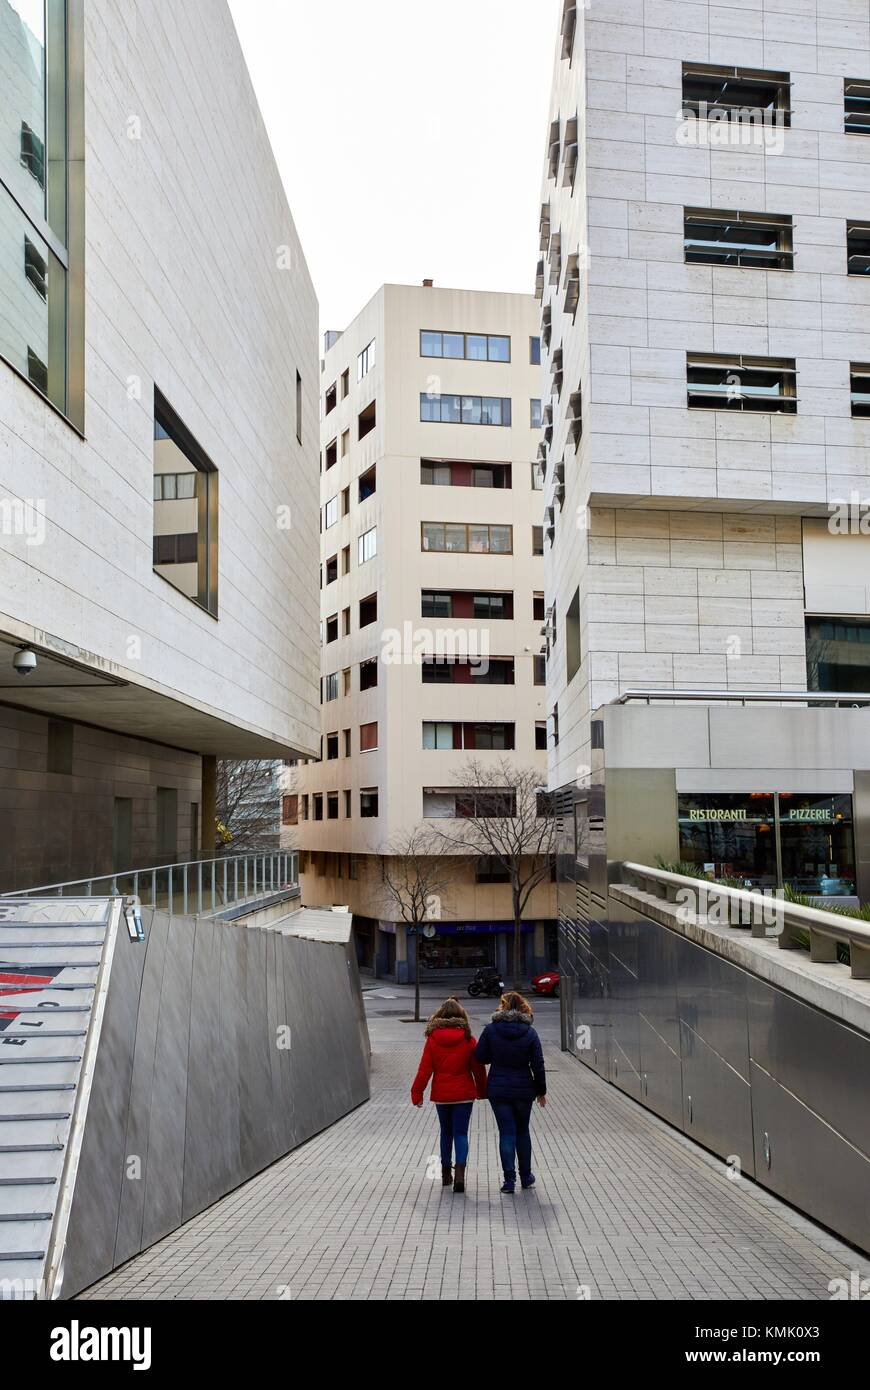 L'illa Mall, Avinguda Diagonal, Barcelona, Catalonia, Spain Stock Photo